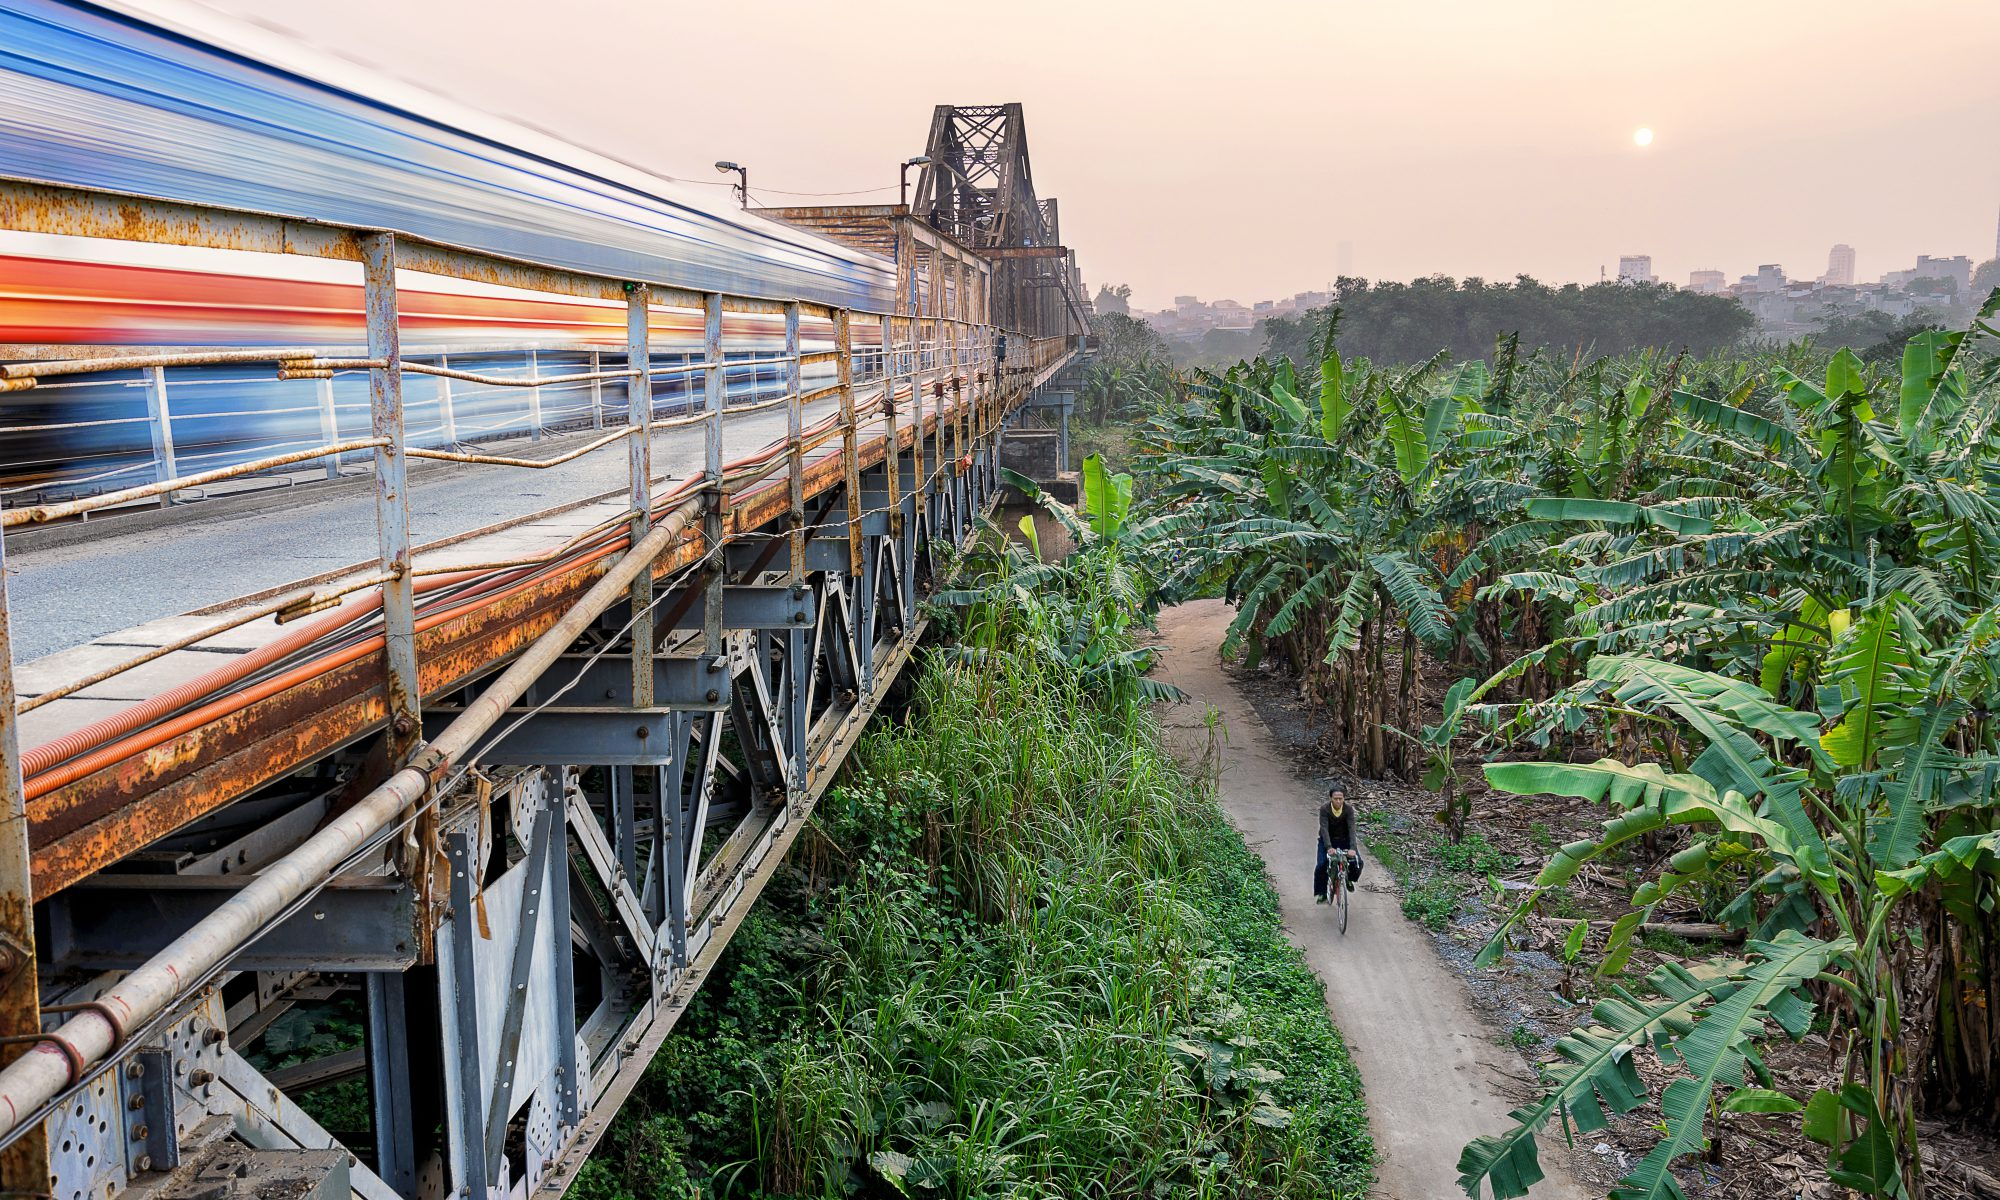 train-through-asia-countryside